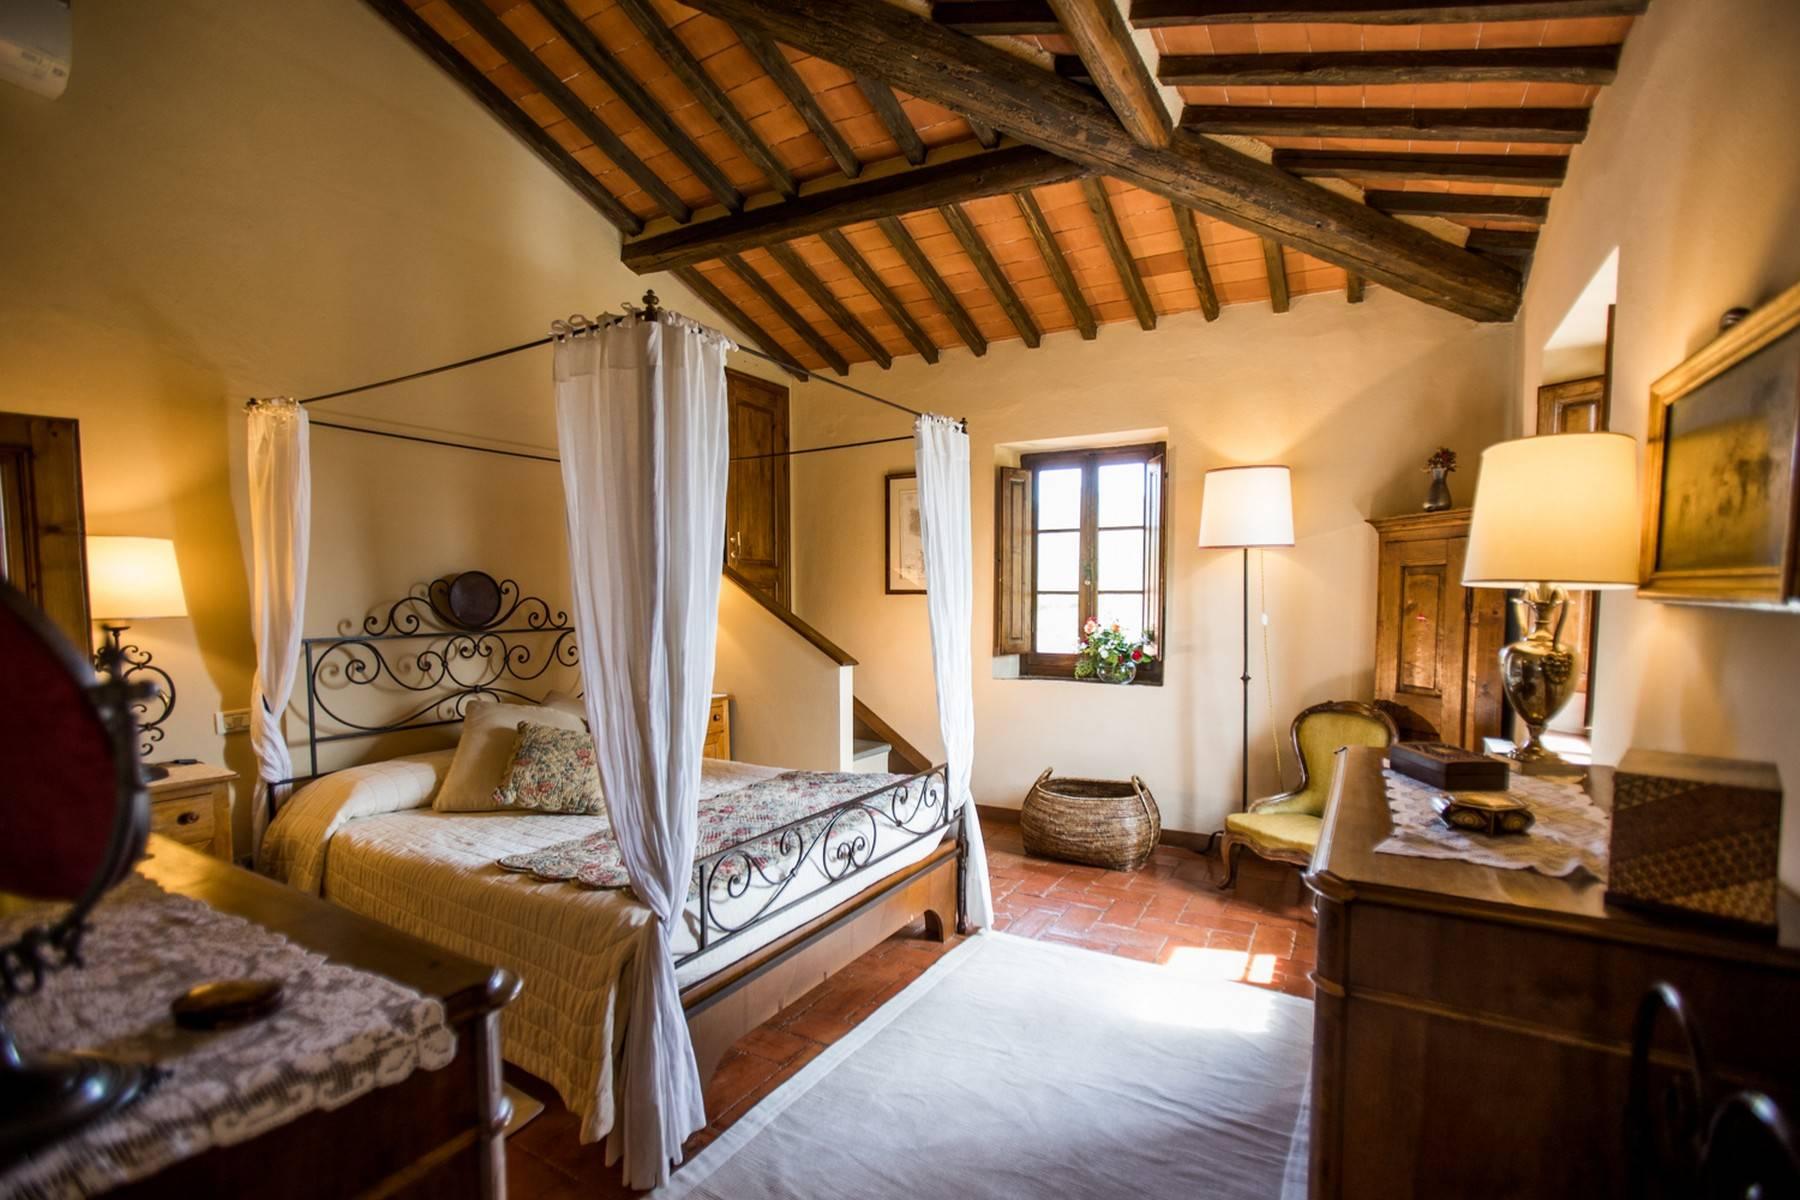 Villa in Vendita a Bucine: 5 locali, 350 mq - Foto 5